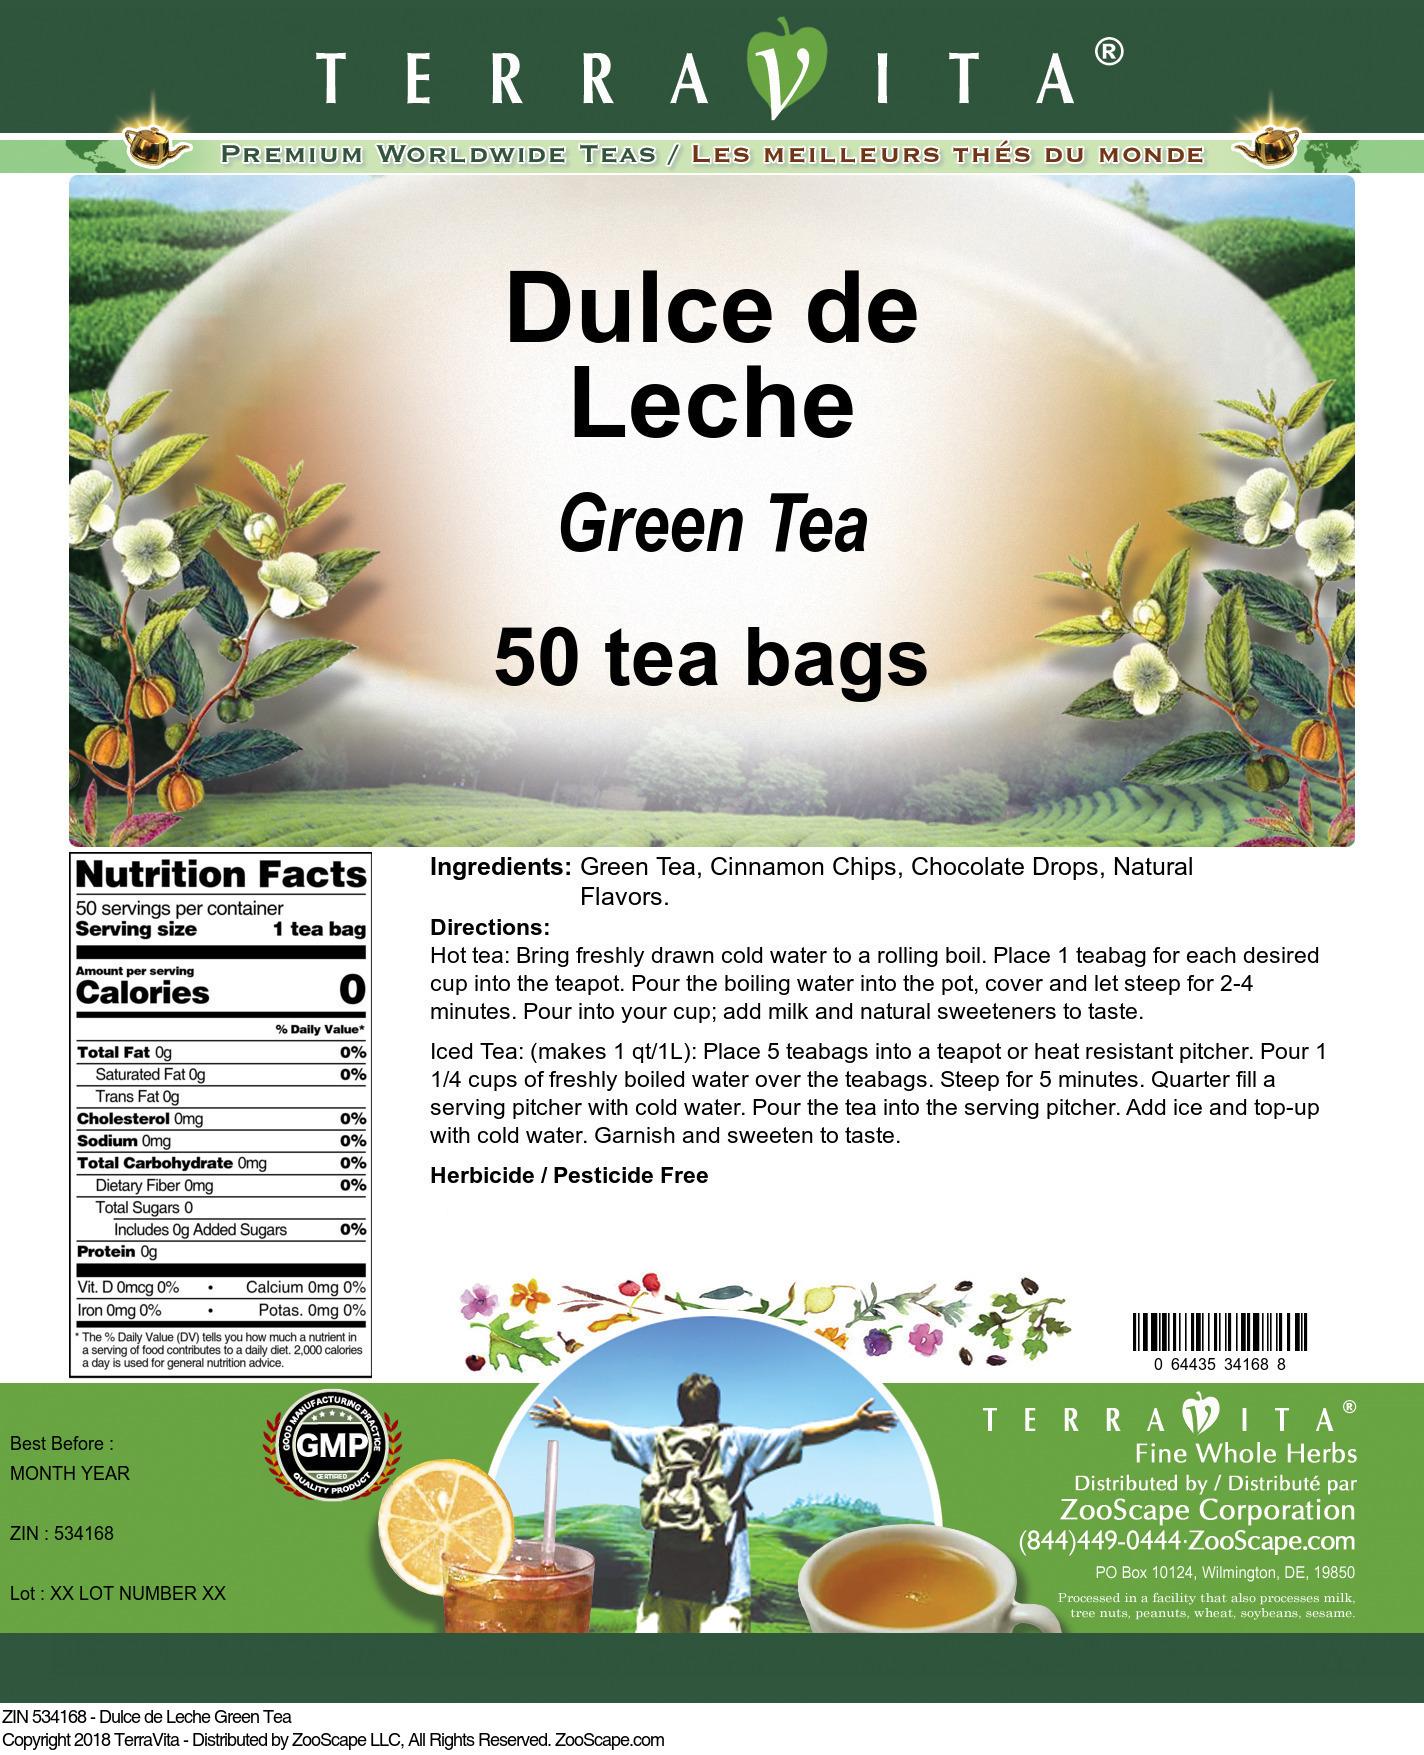 Dulce de Leche Green Tea